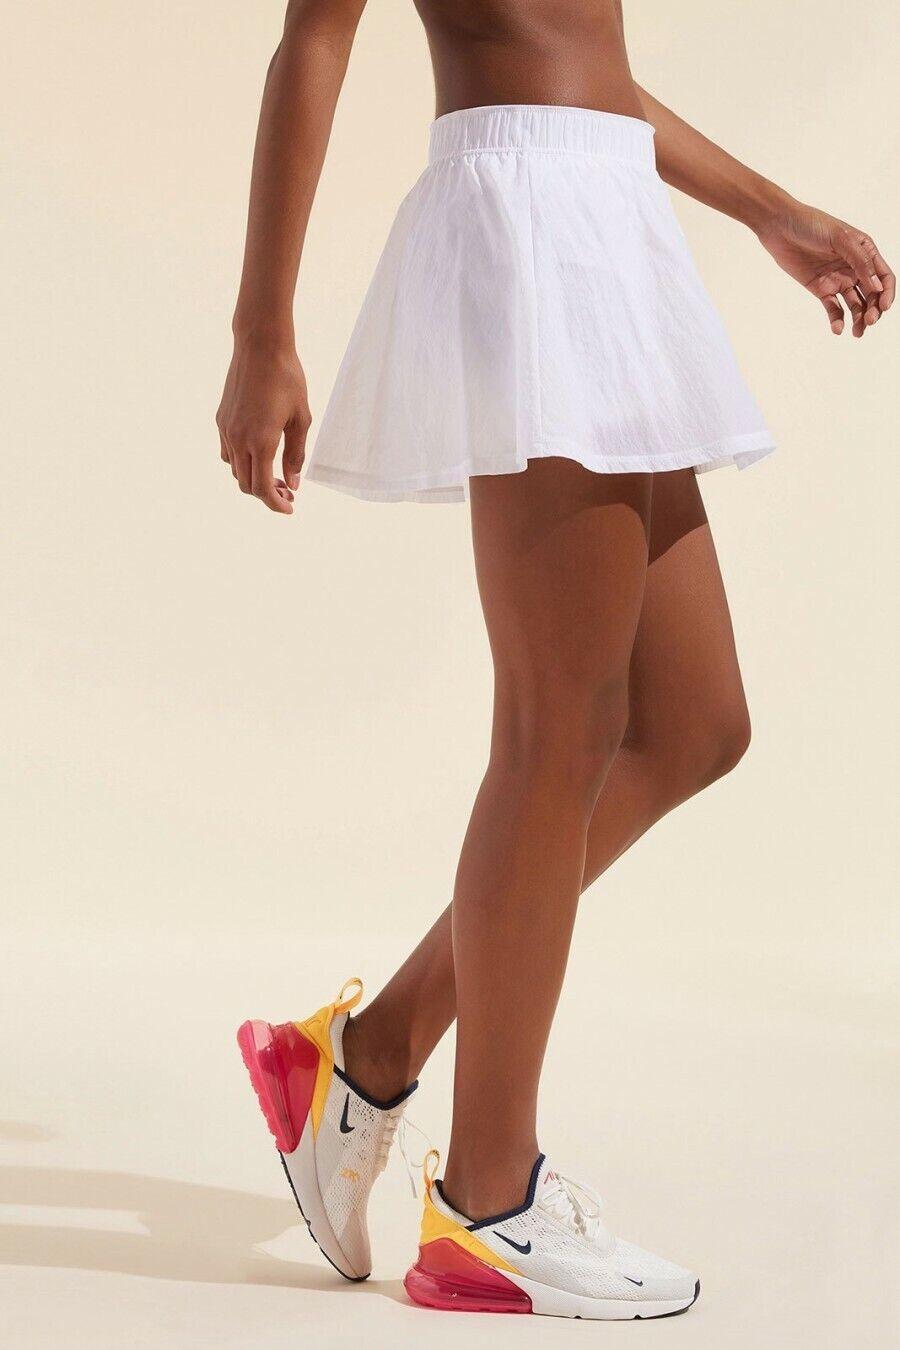 NikeCourt Spring  Flex Dri-FIT Women's Skirt Tennis skirt Built-in Tights  novelty items